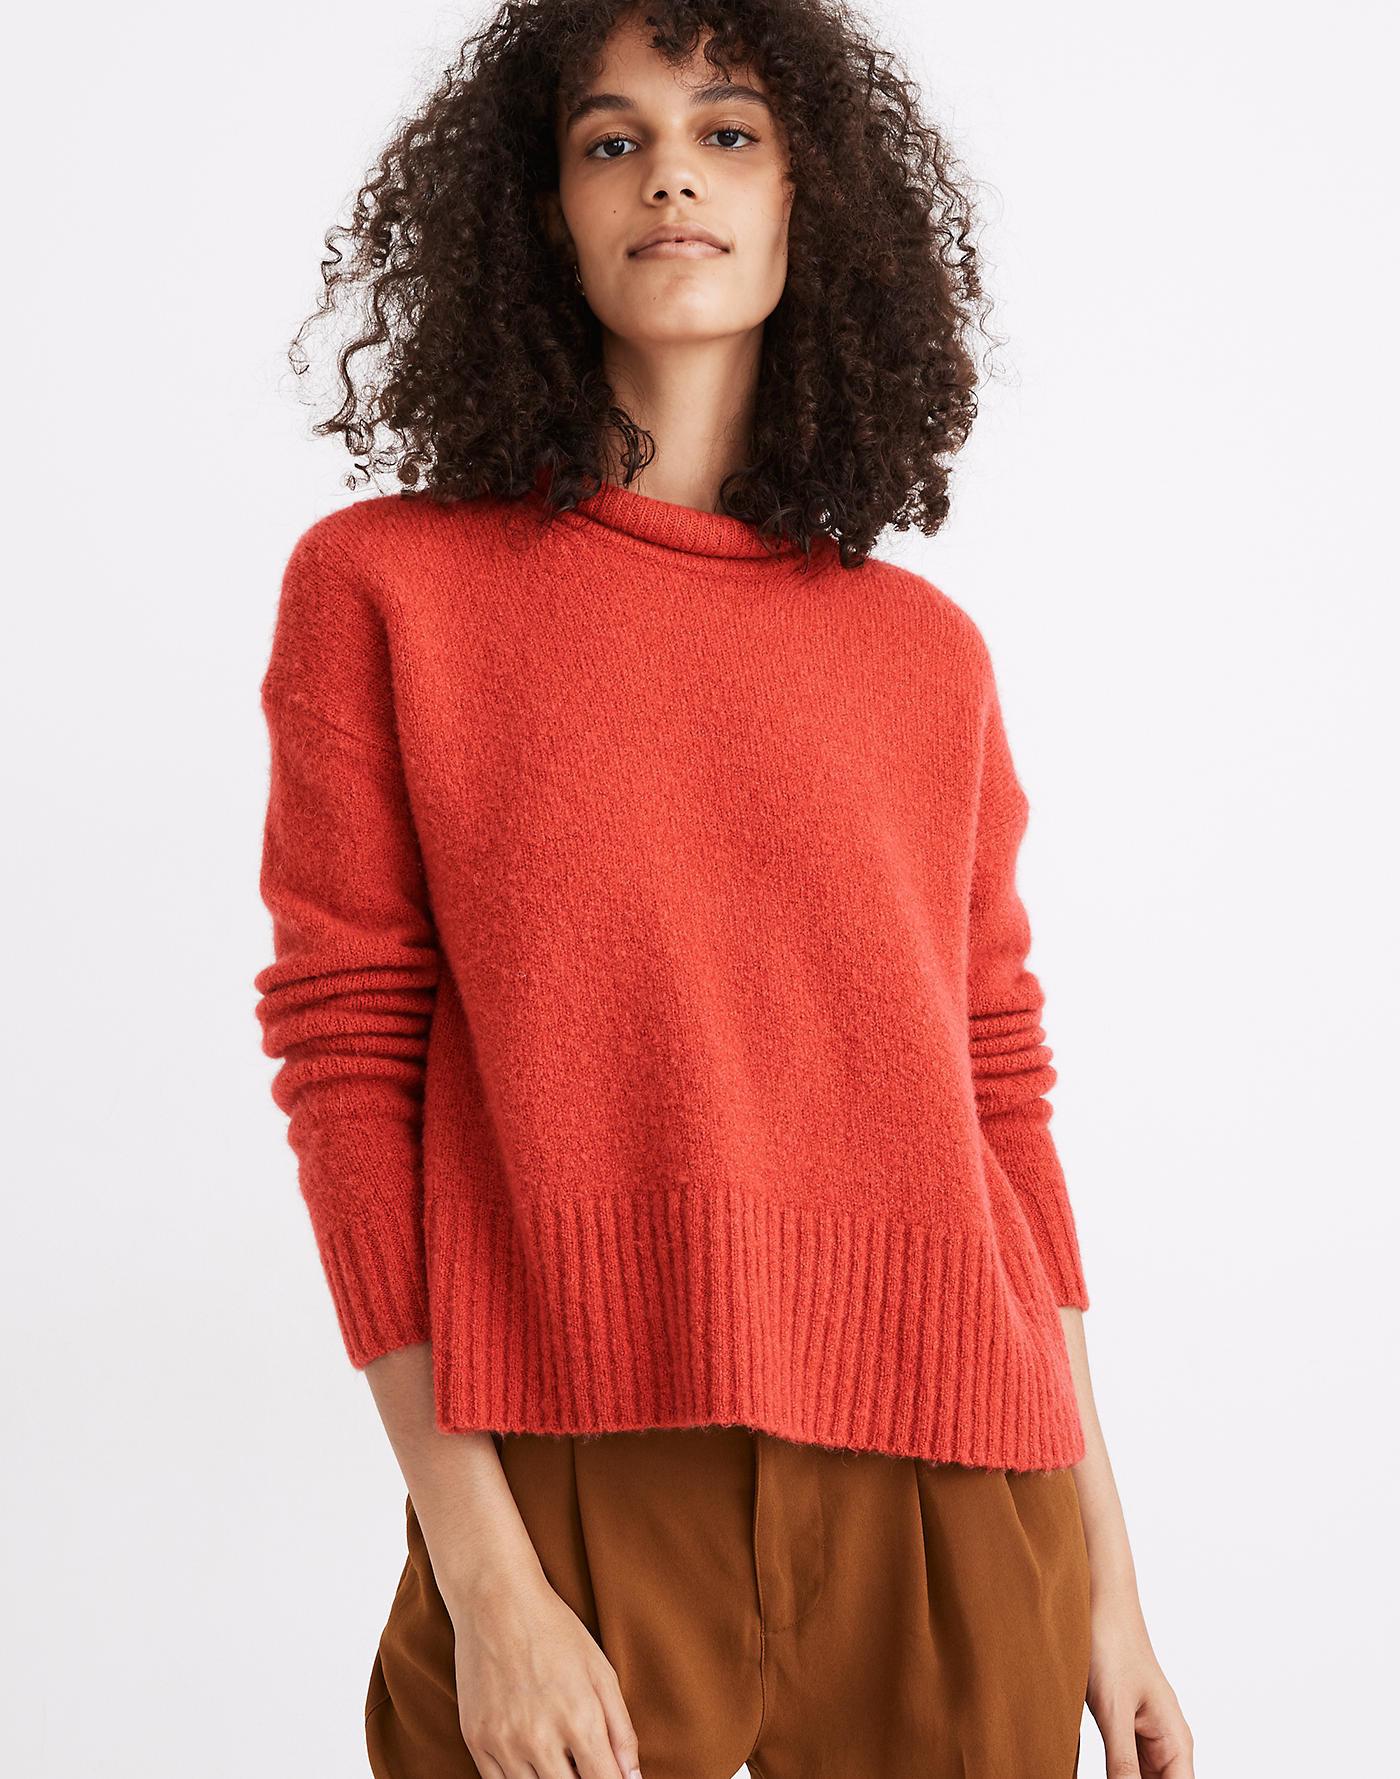 Model wearing red-orange pullover